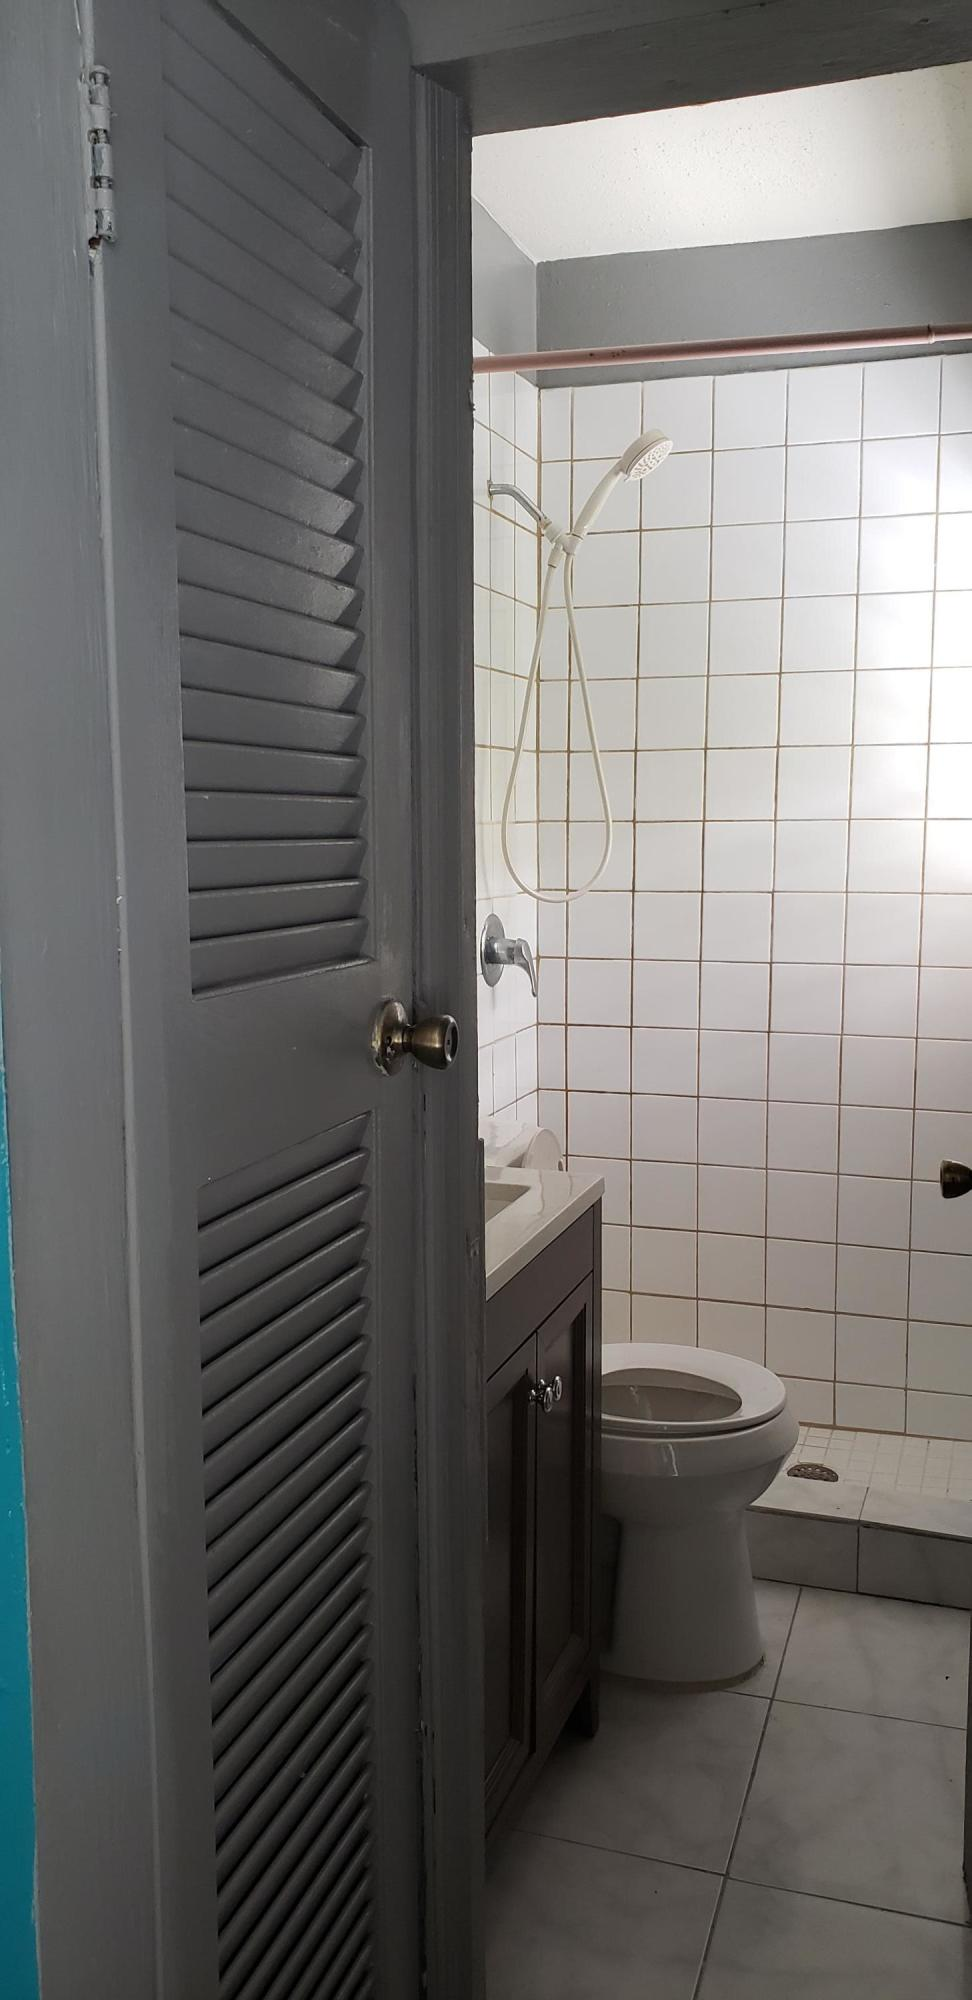 Bathroom Full View